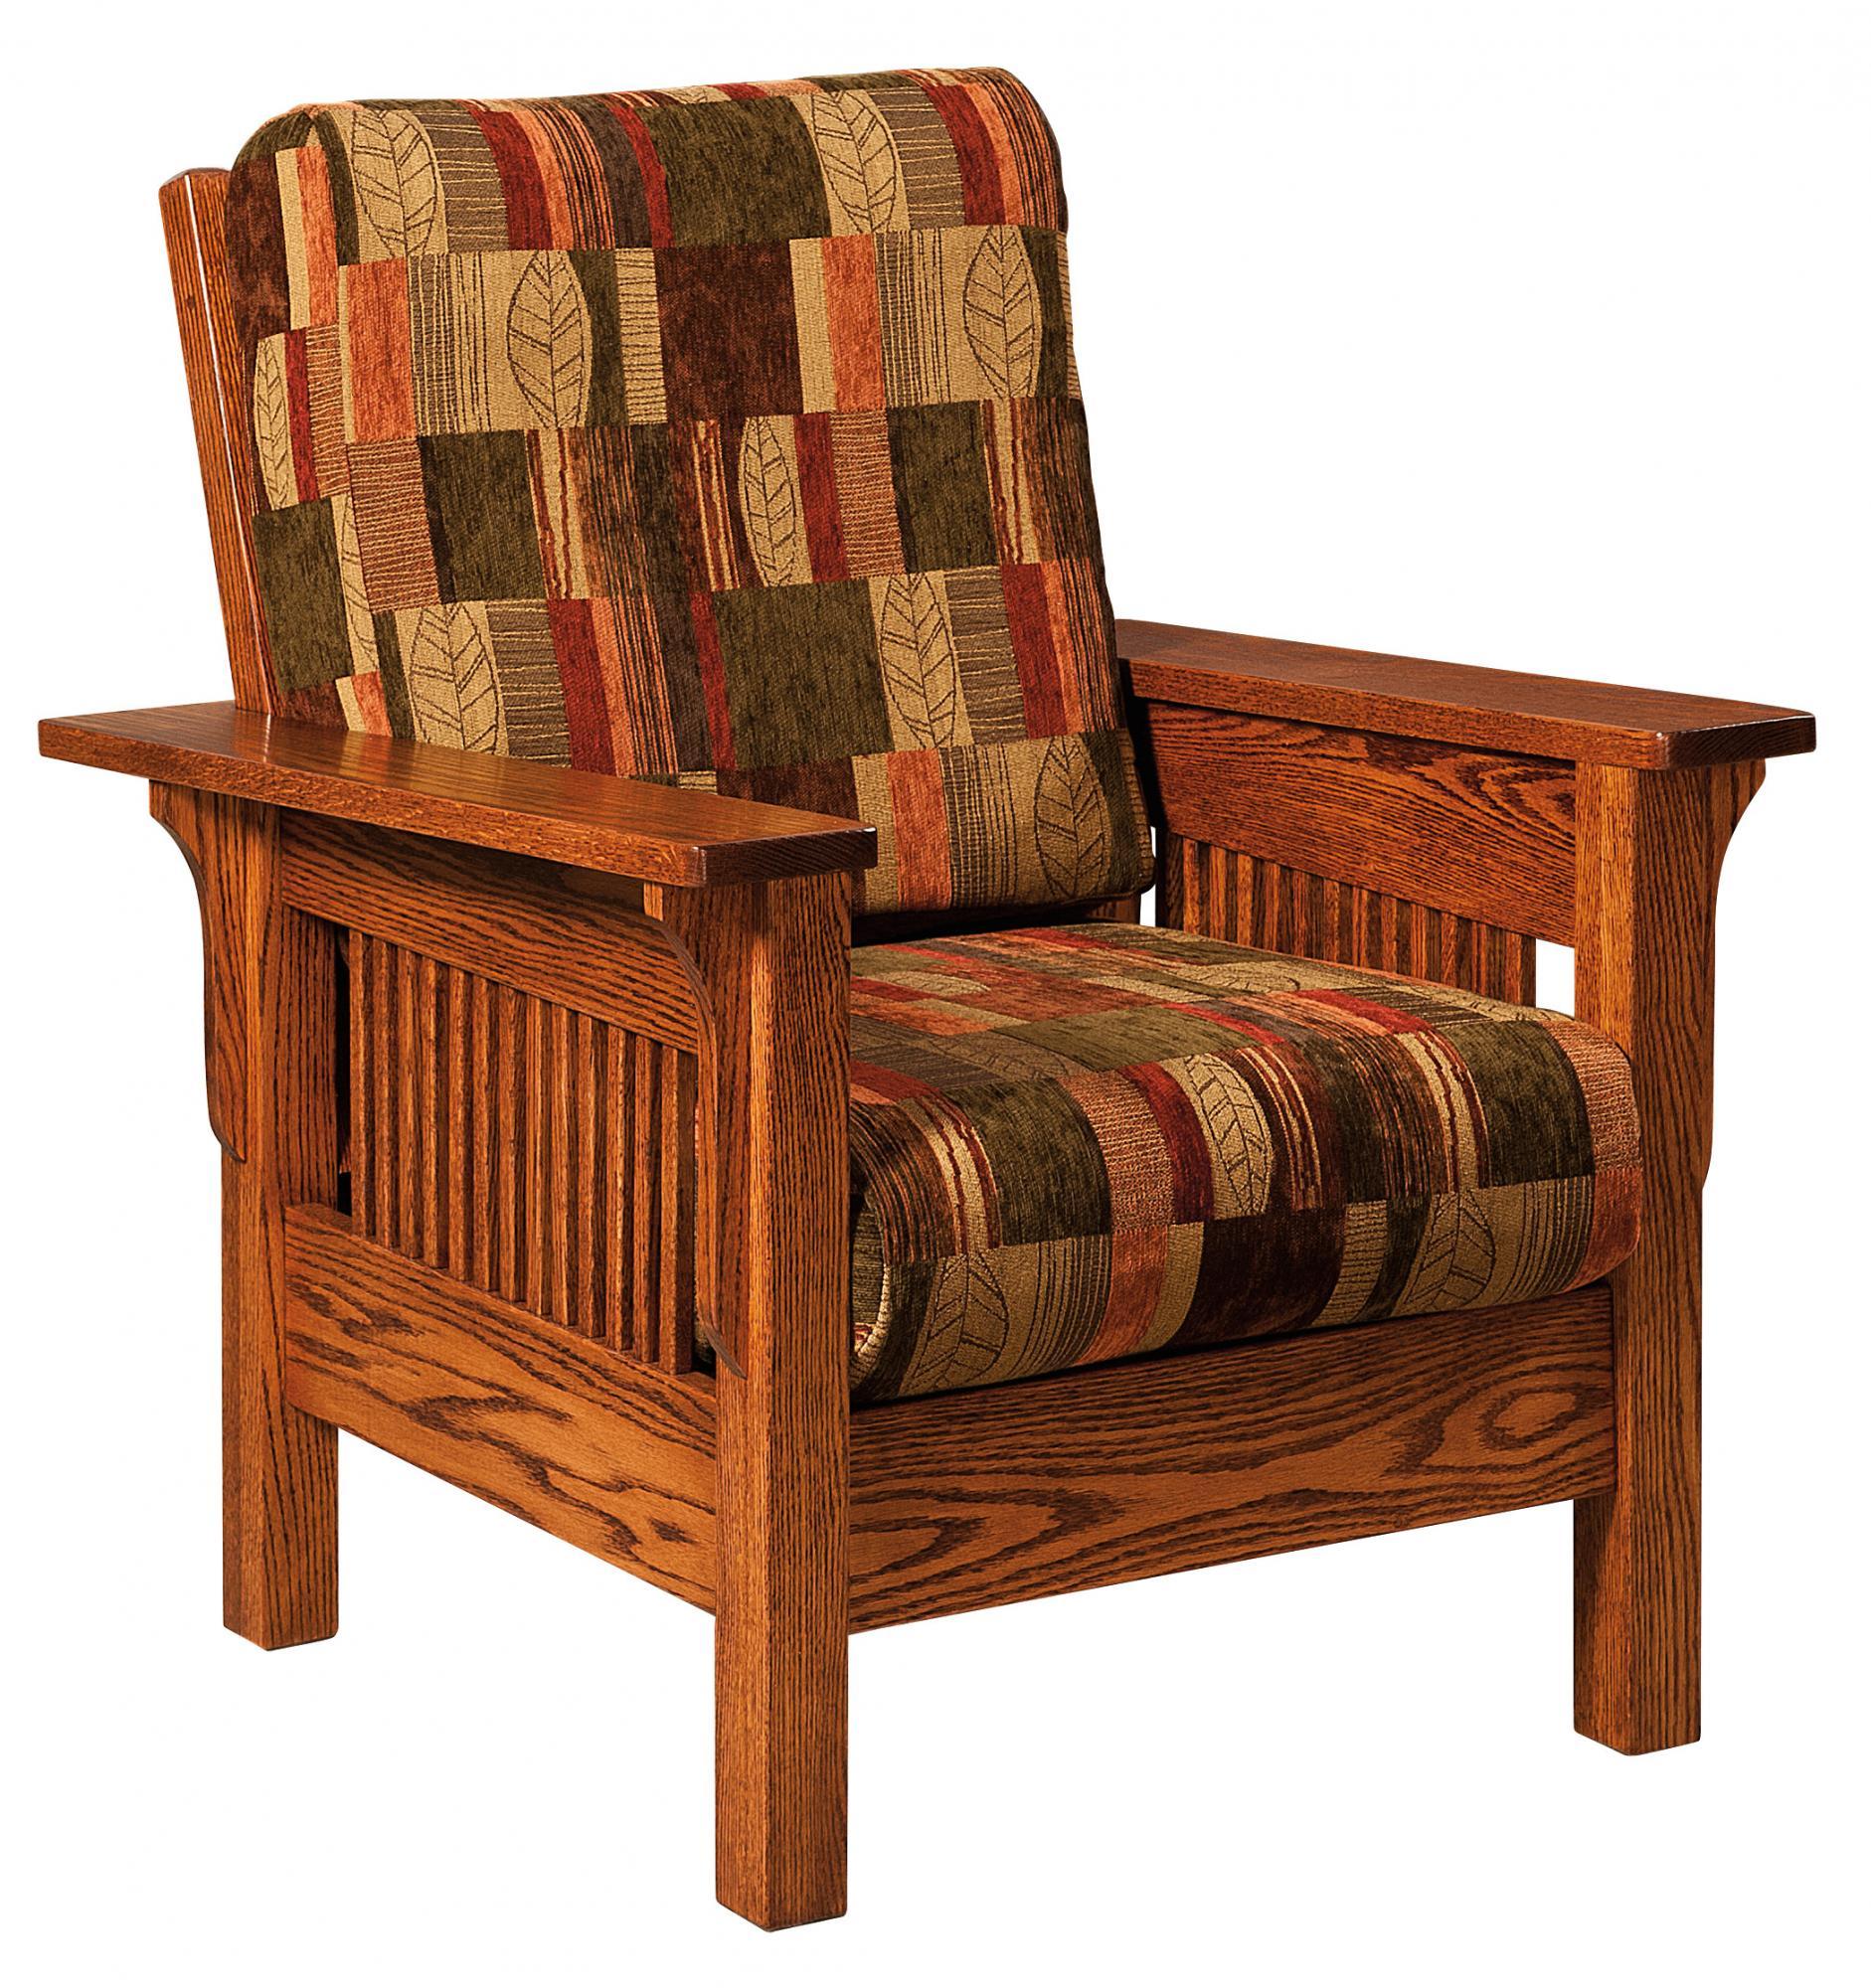 furniture stores in mankato mn furniture mattress store mankato new ulm mesa sofa loveseat and